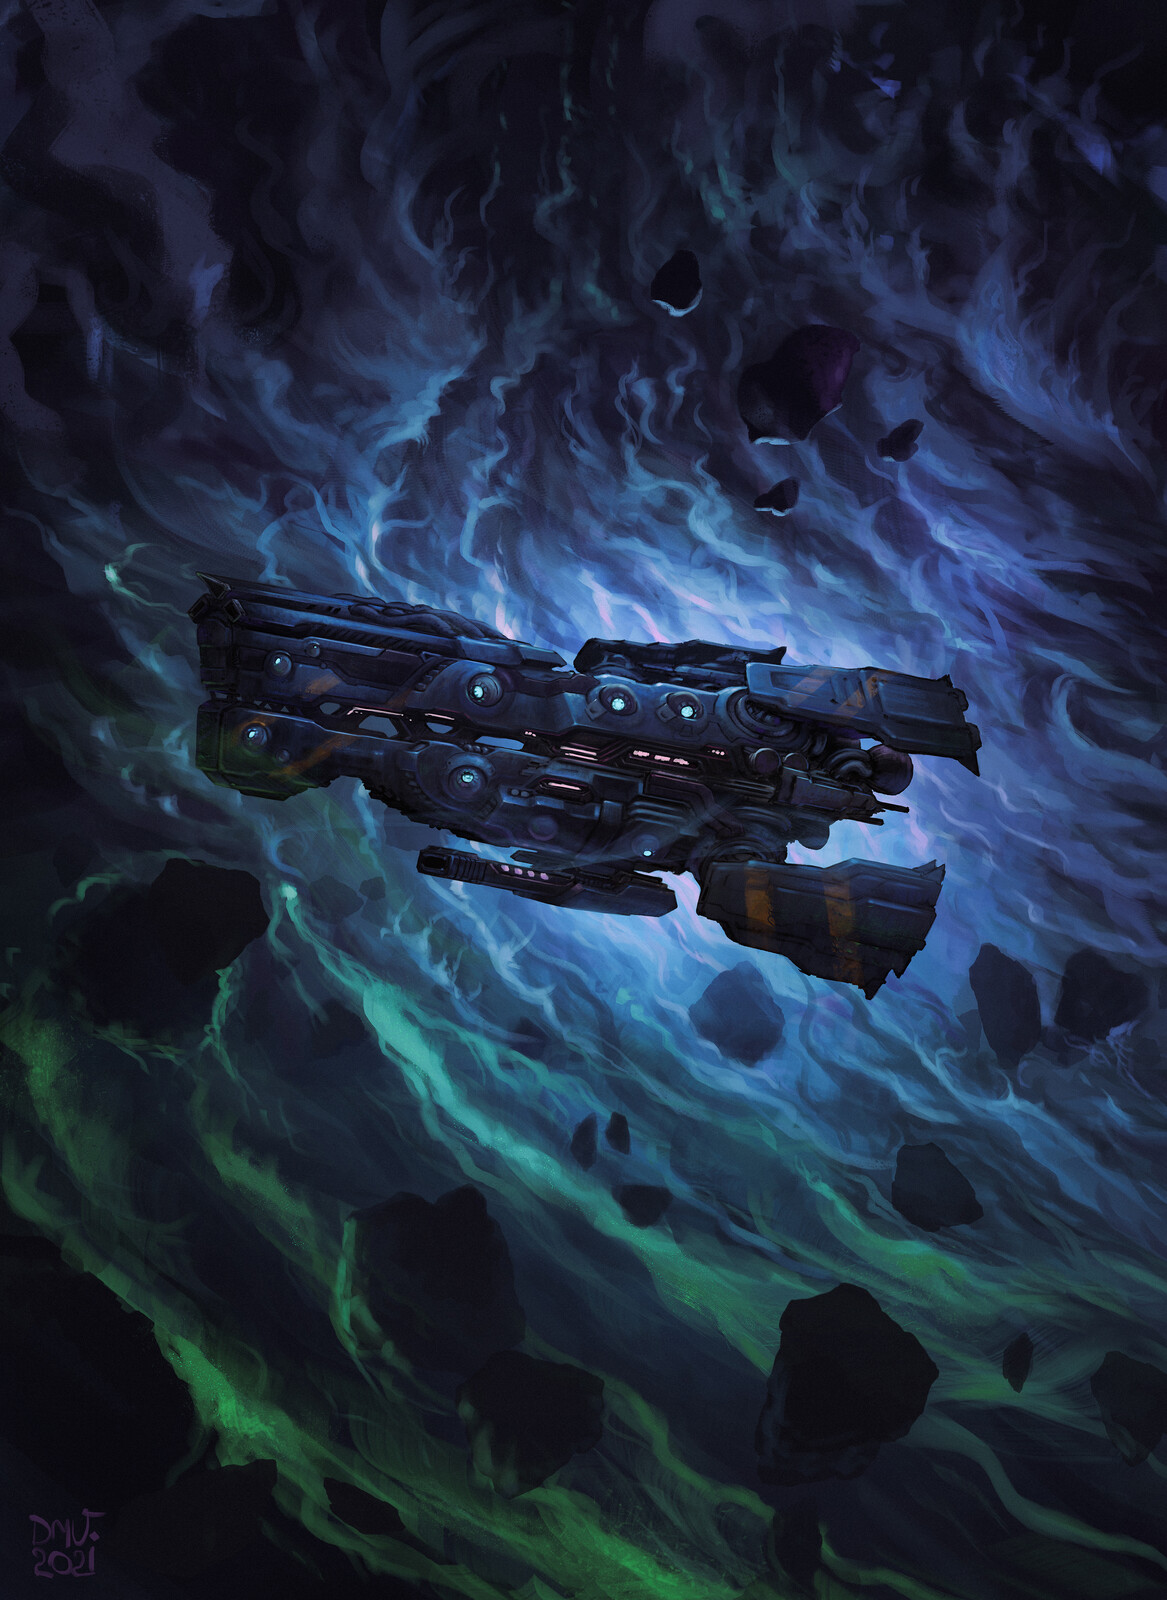 Defensive starship